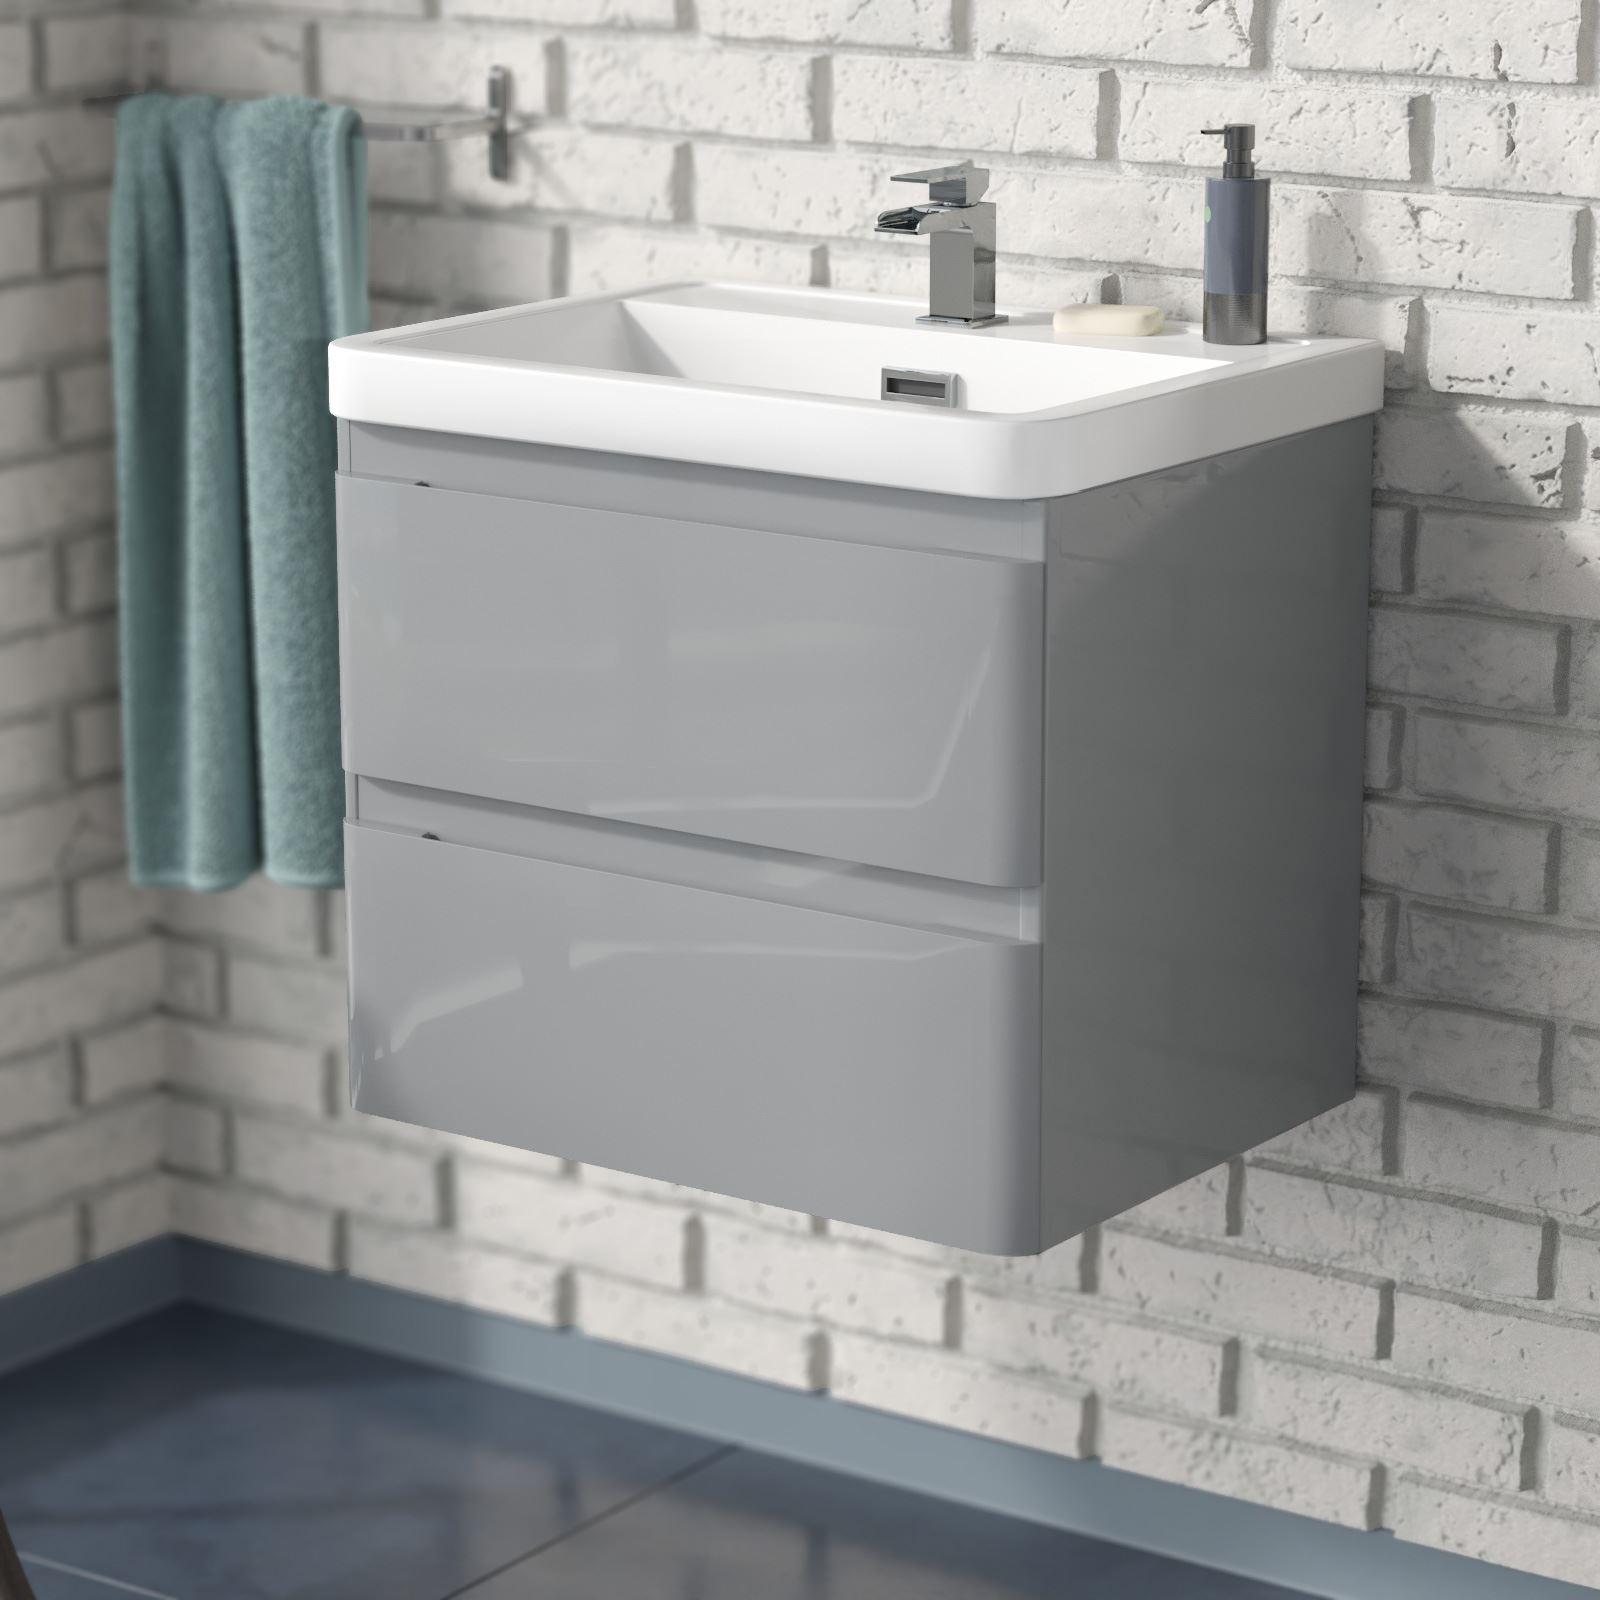 Charta 600mm Bathroom Basin Sink Wall Hung Vanity Unit